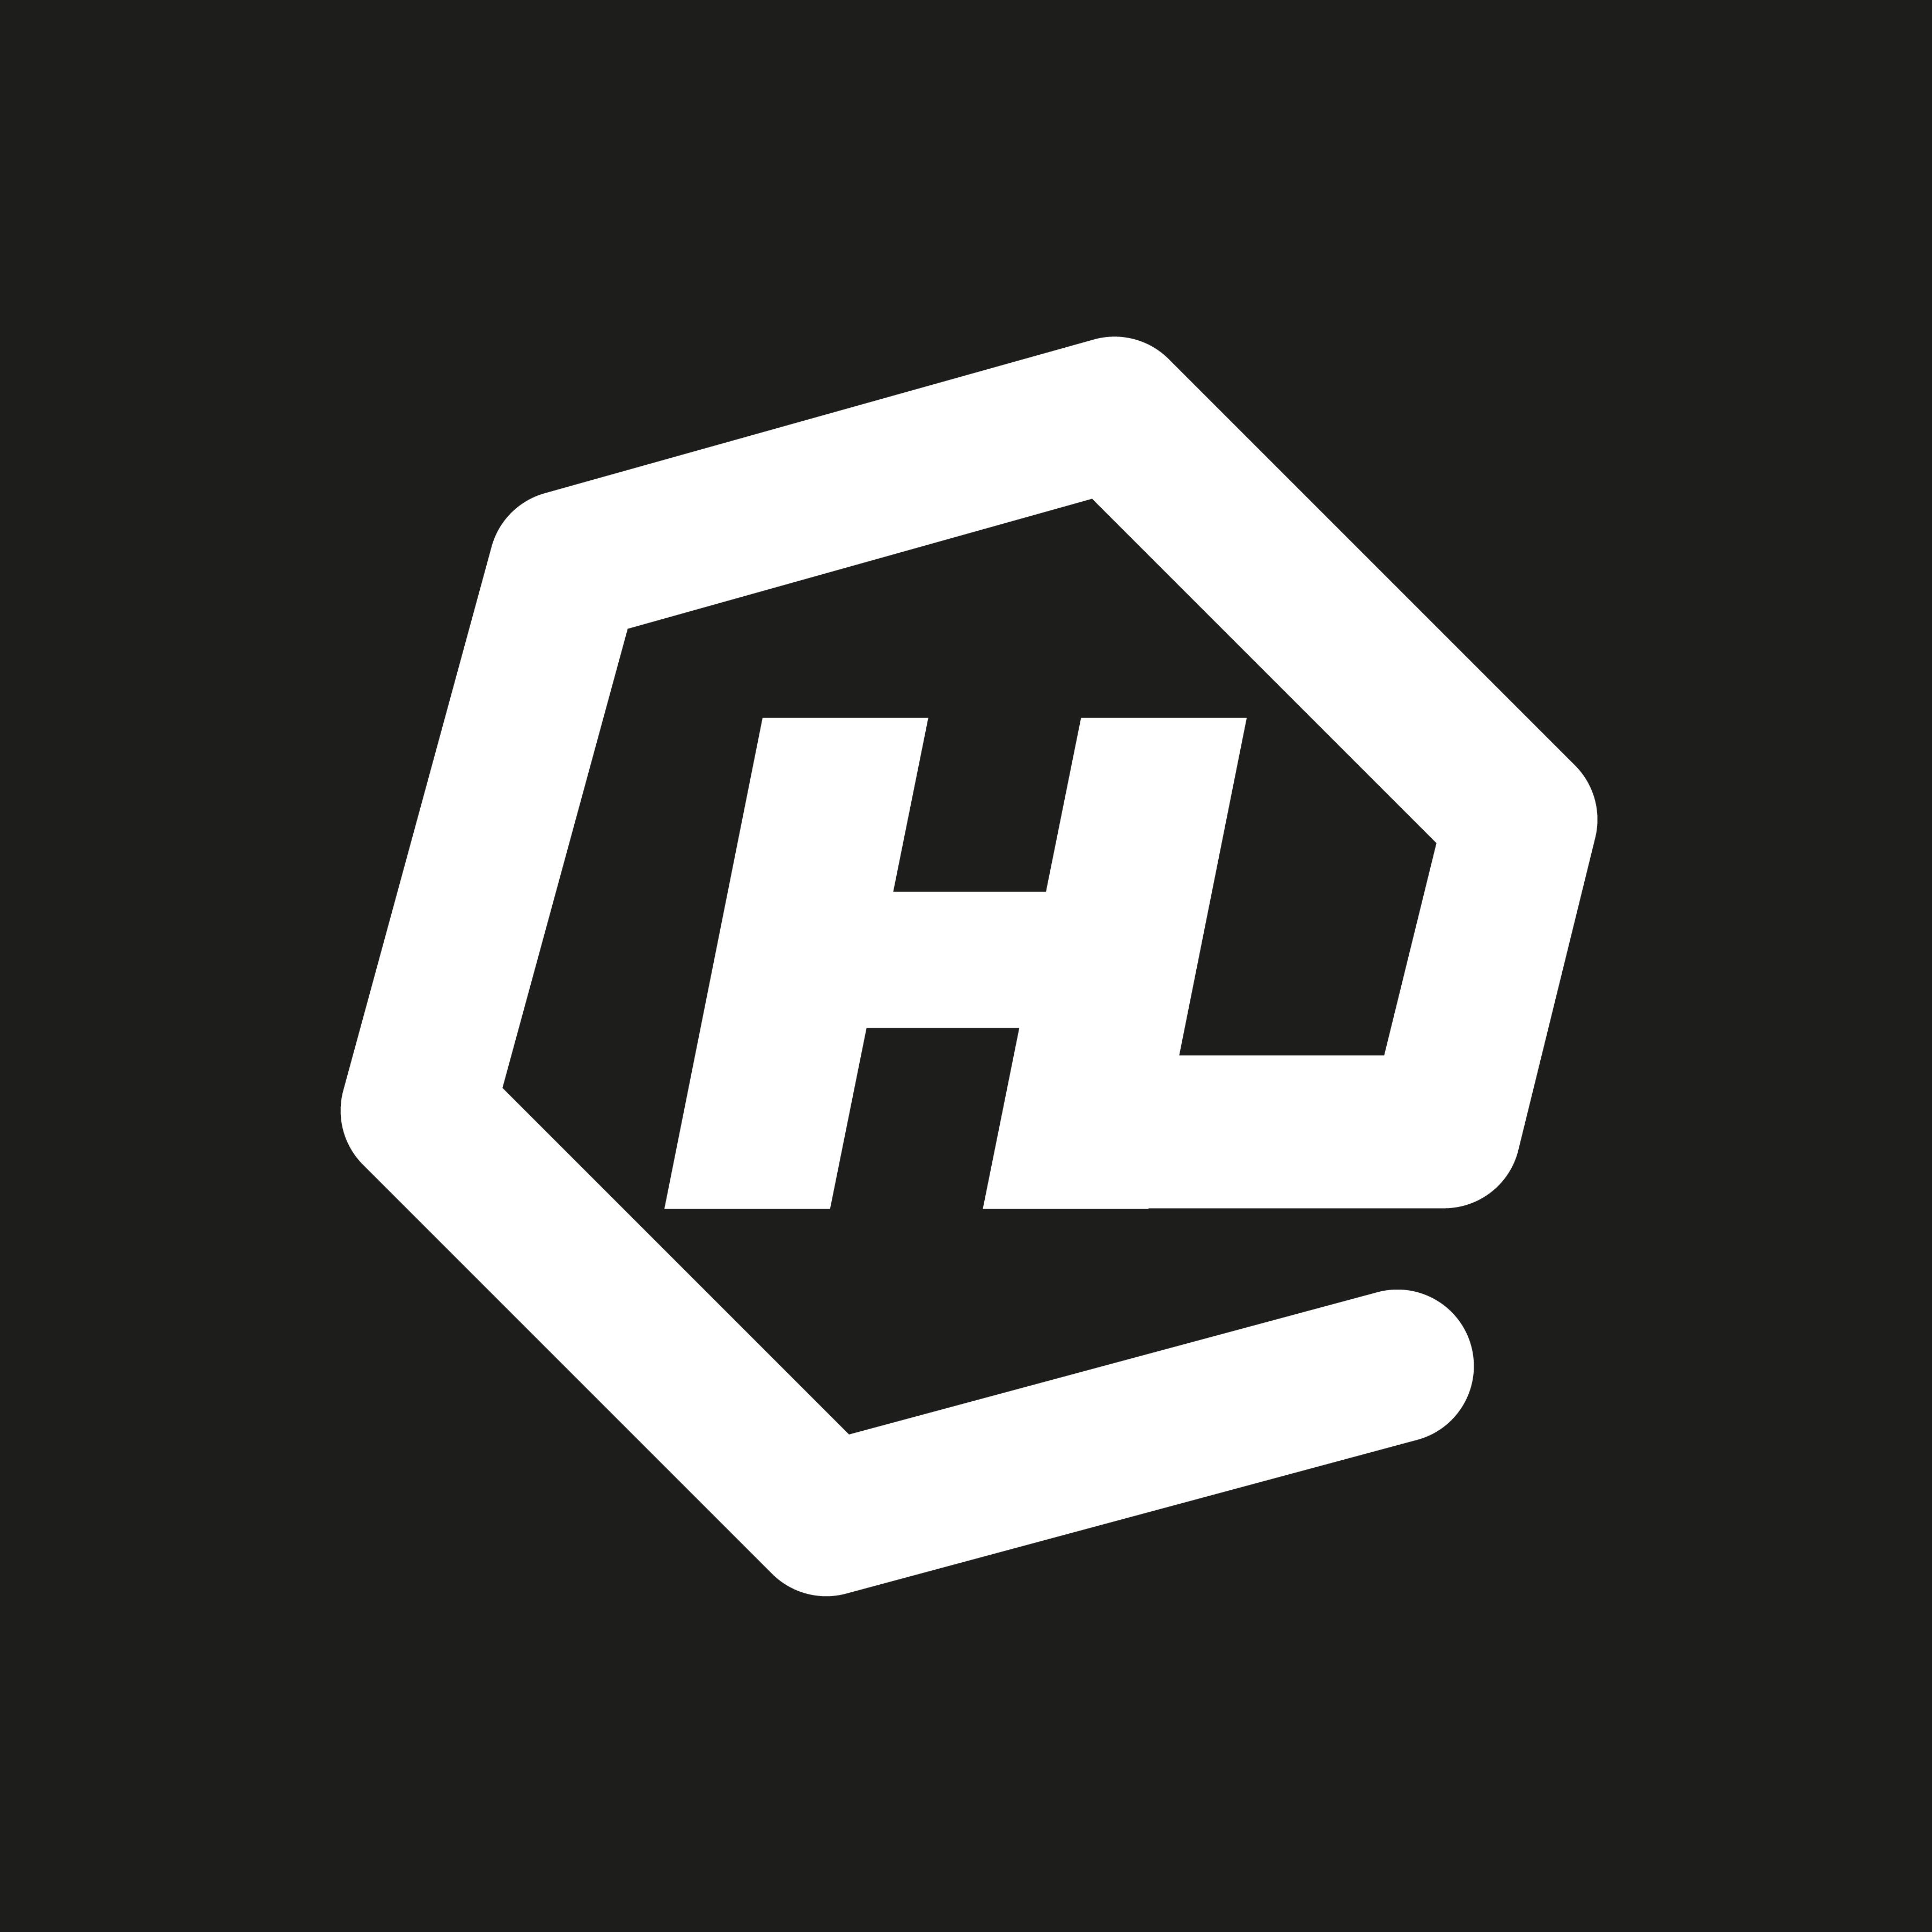 Make Honey Ltd internships in Central London, London